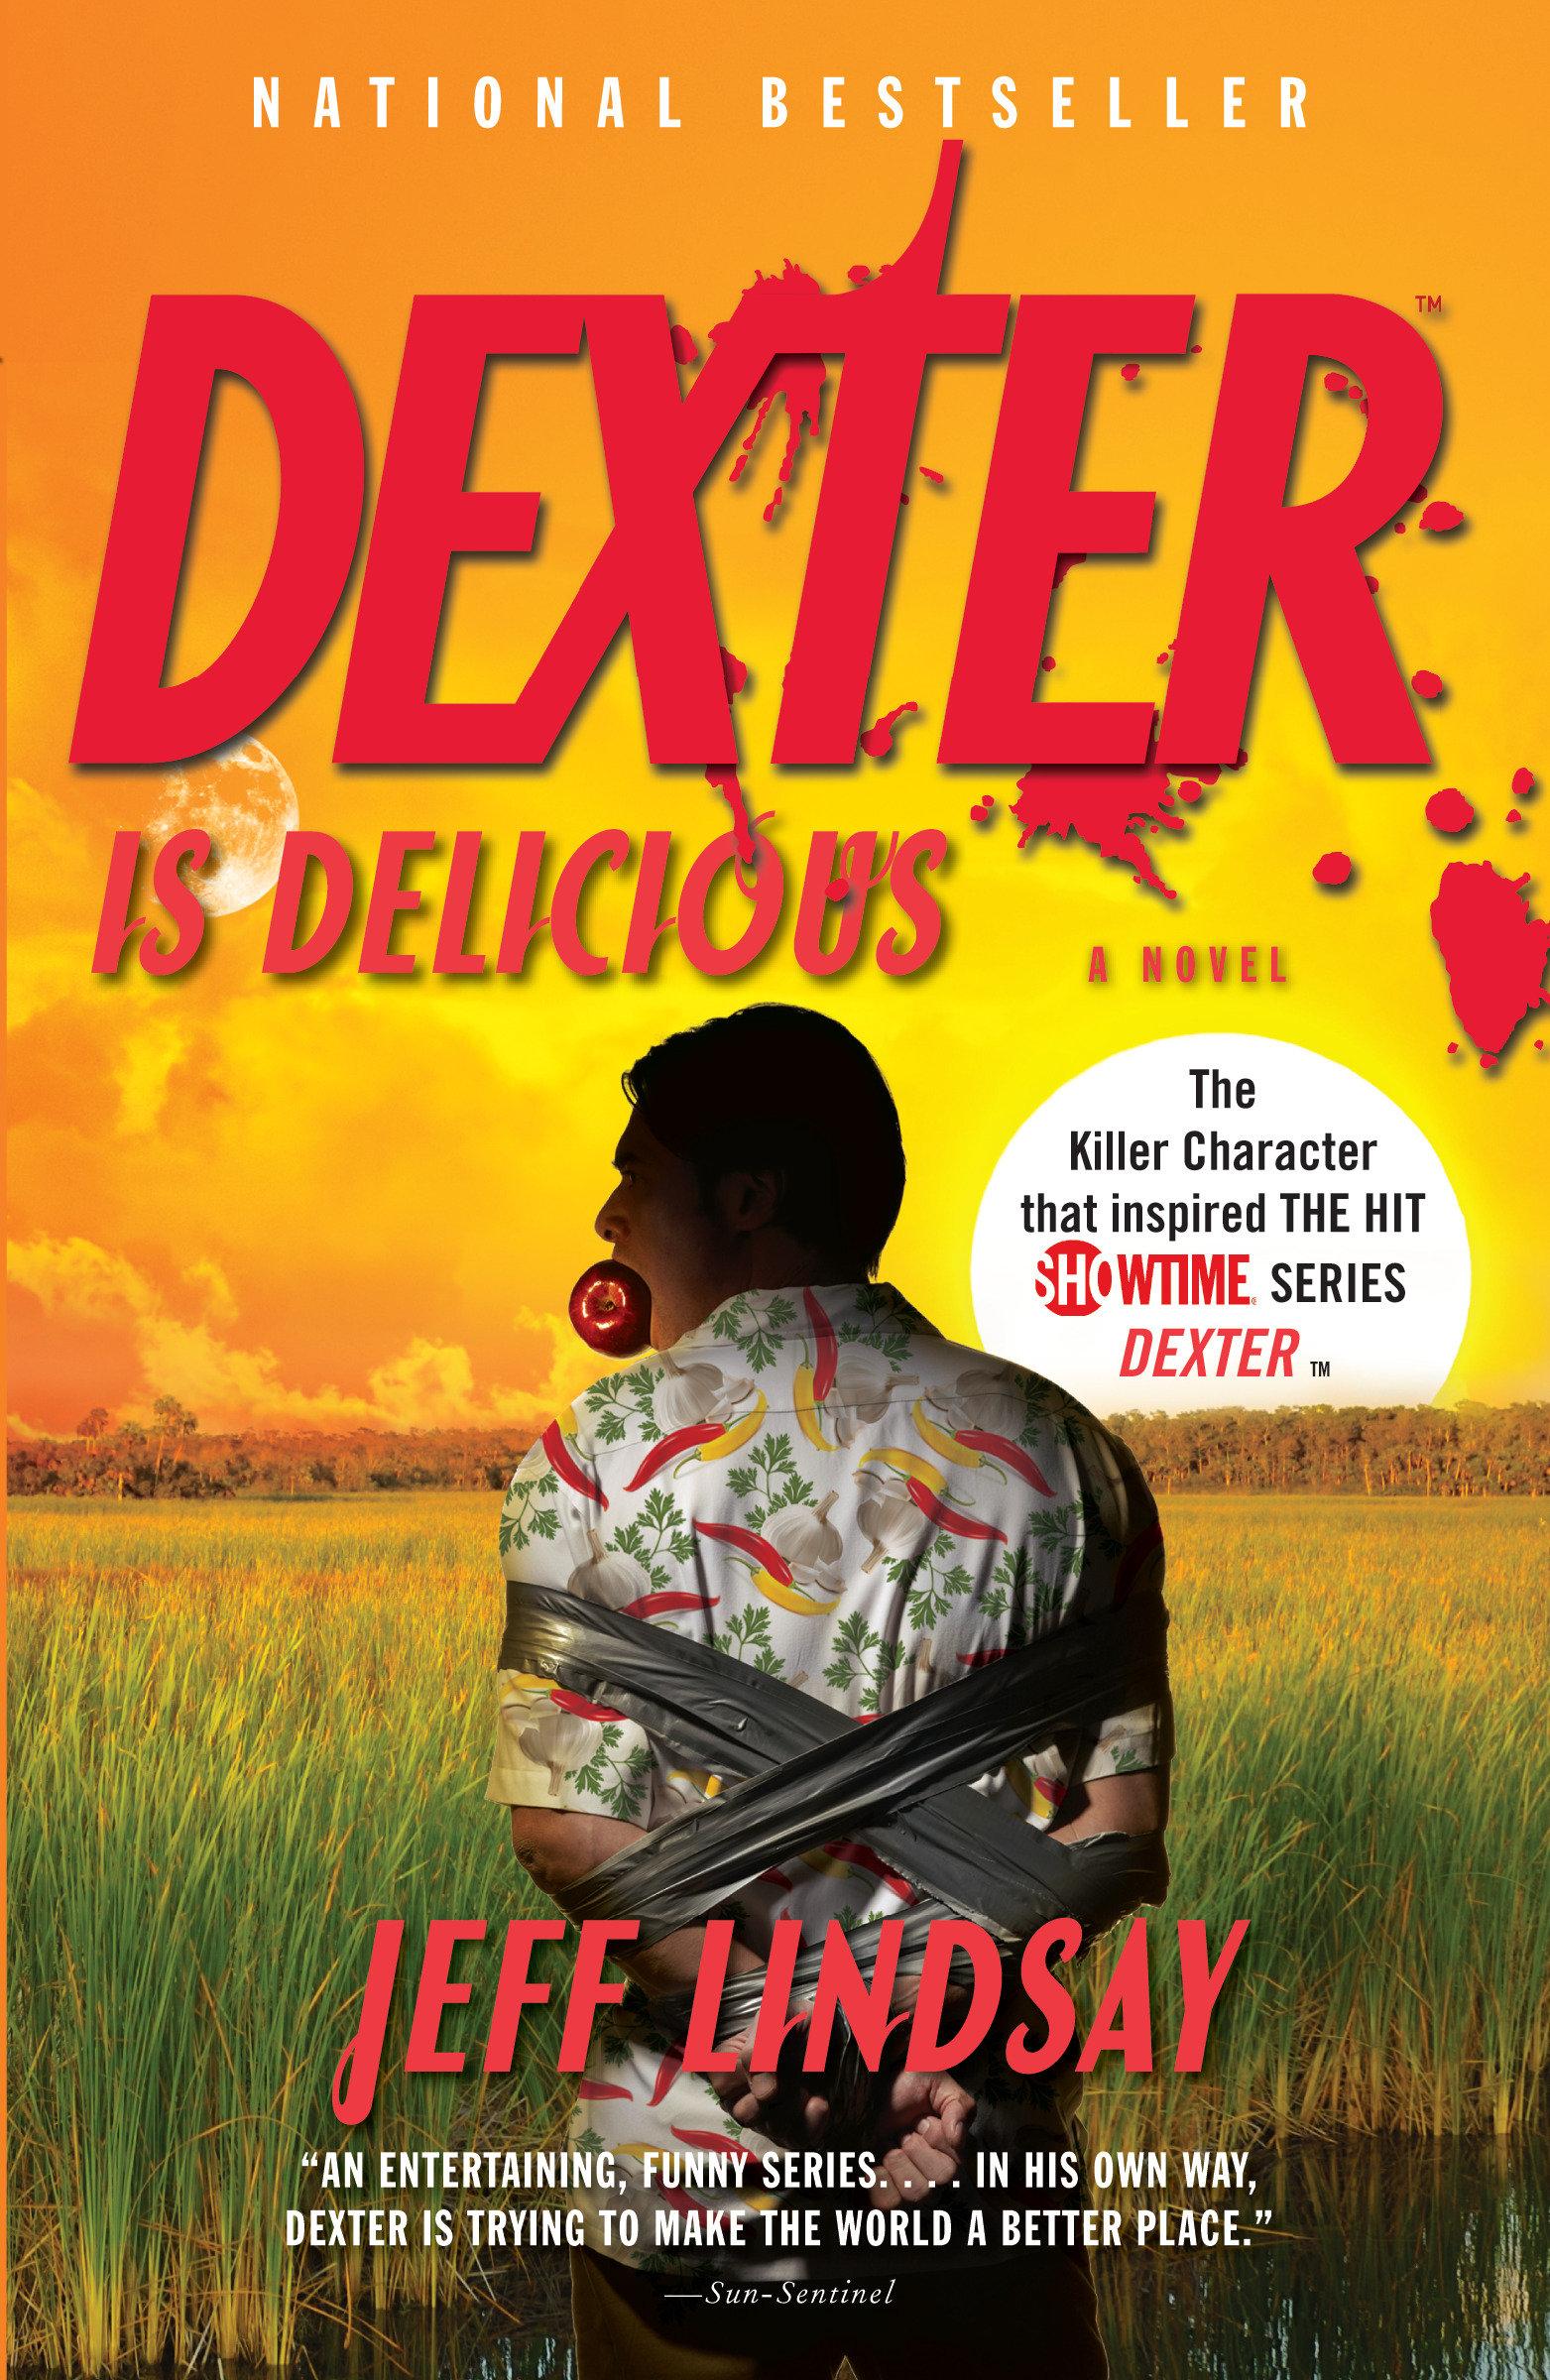 Dexter is delicious a novel